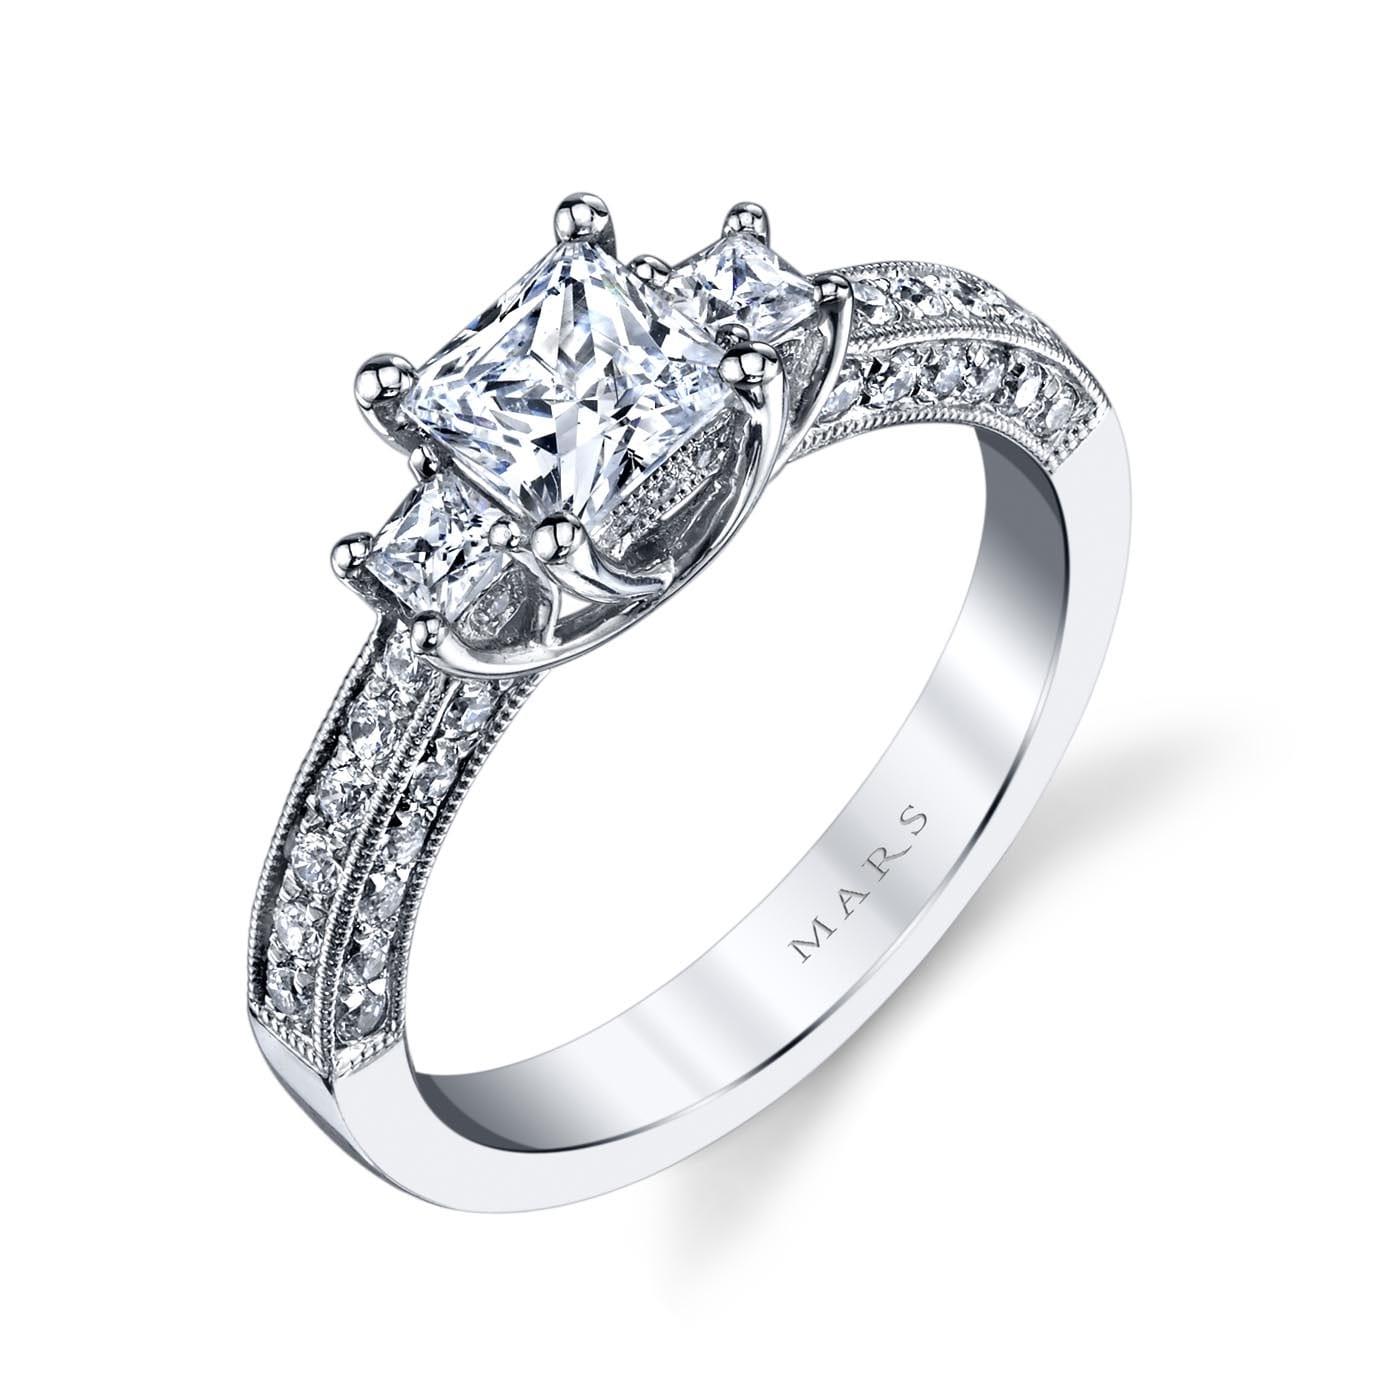 Three_Stone Engagement RingStyle #: MARS 25923